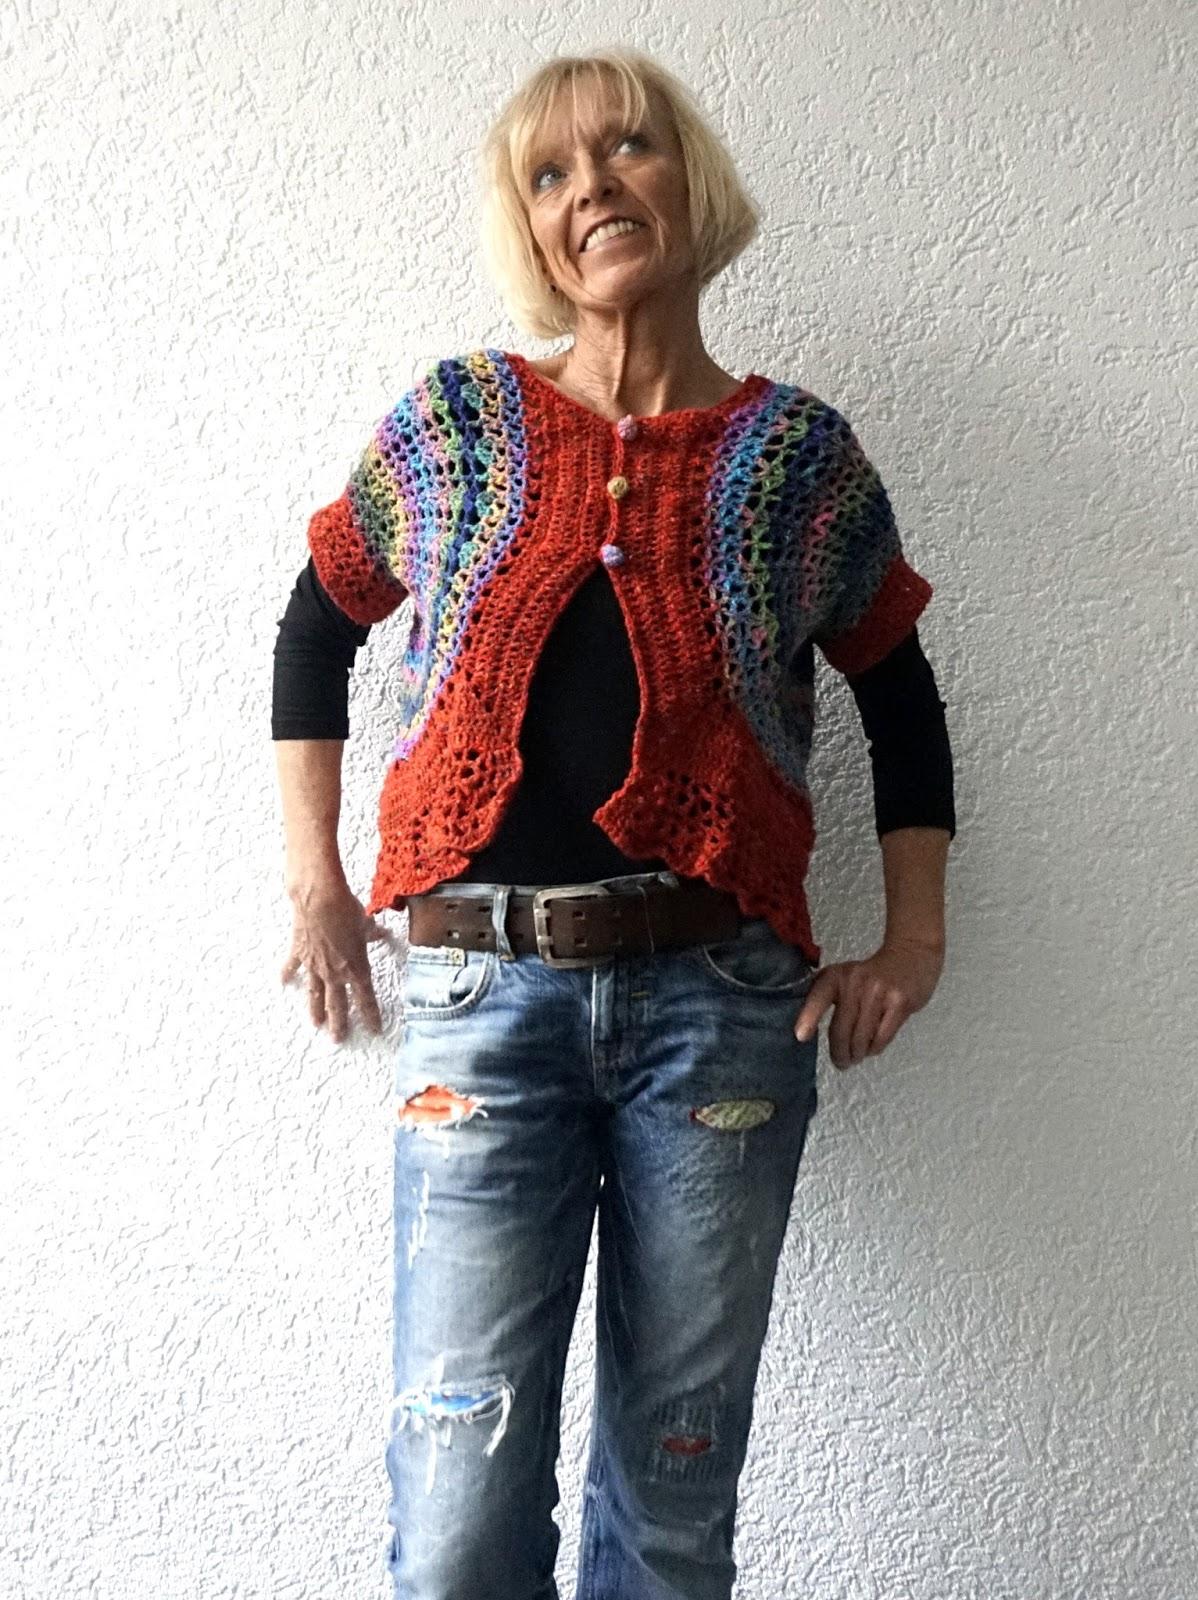 Kreativ mit täschwerk : Bolero, Weste häkeln